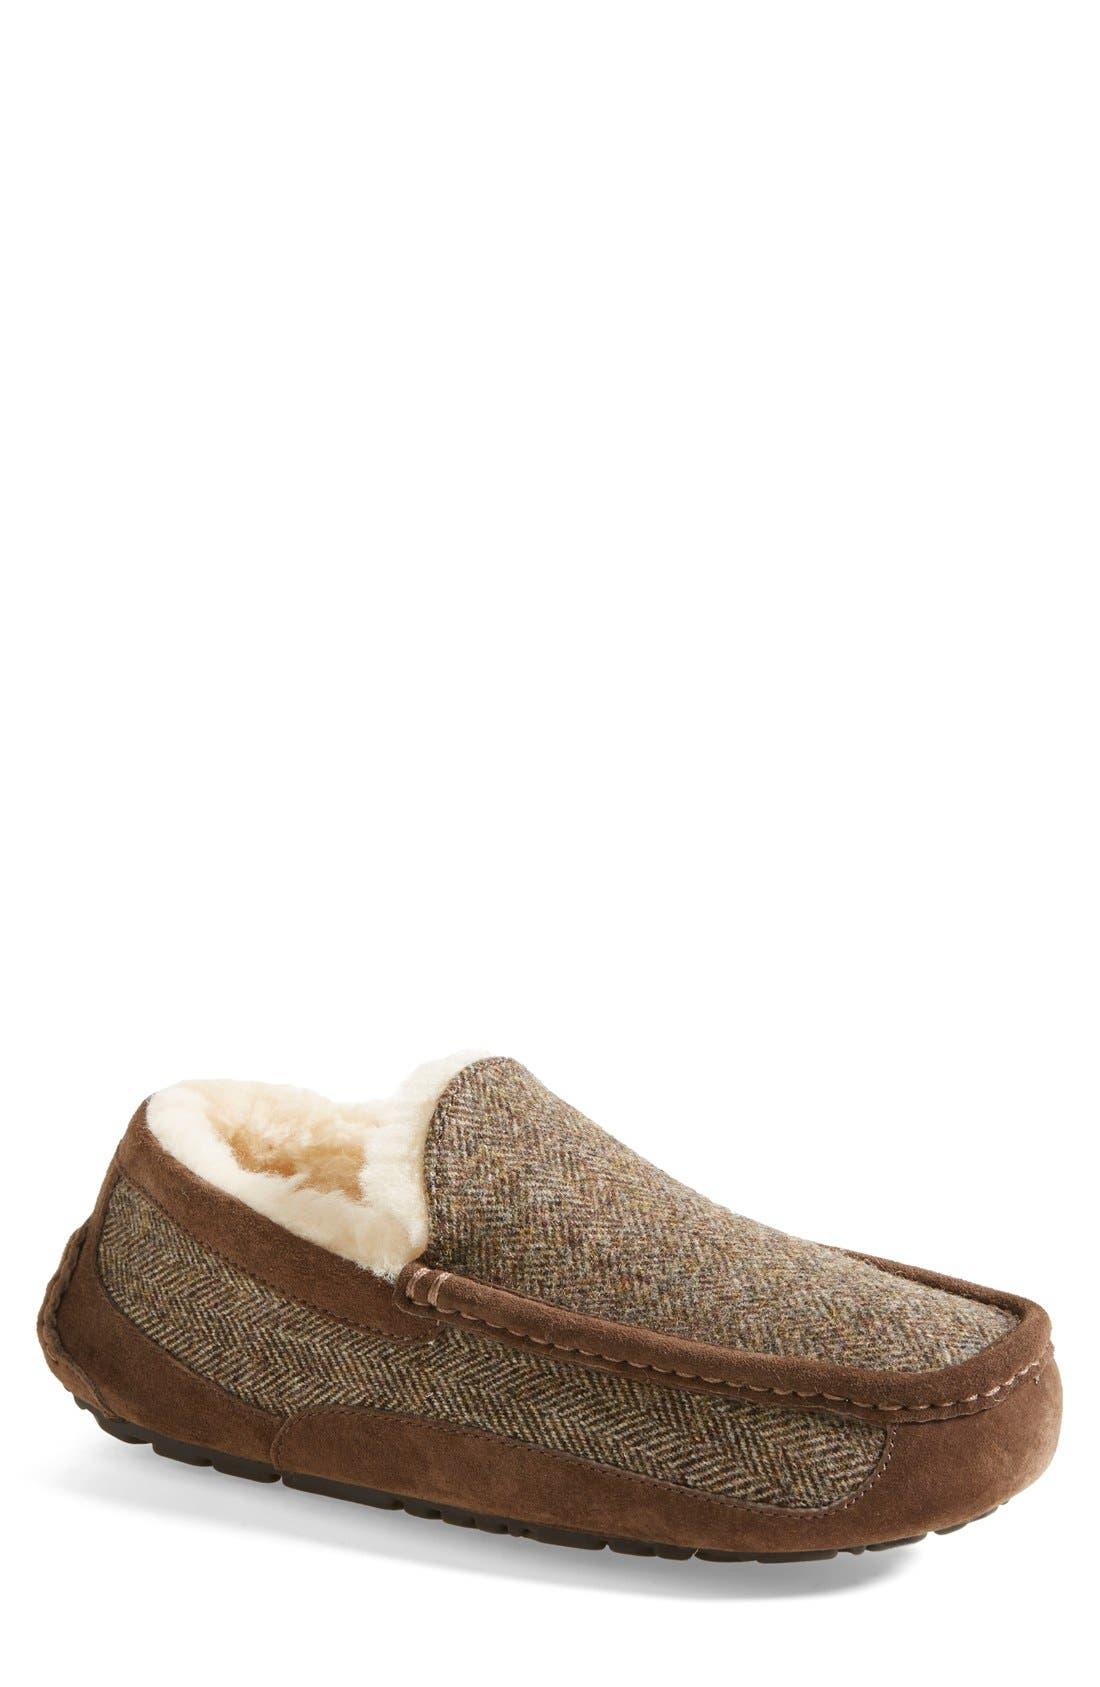 Ascot Tweed Slipper,                             Main thumbnail 1, color,                             Stout Tweed